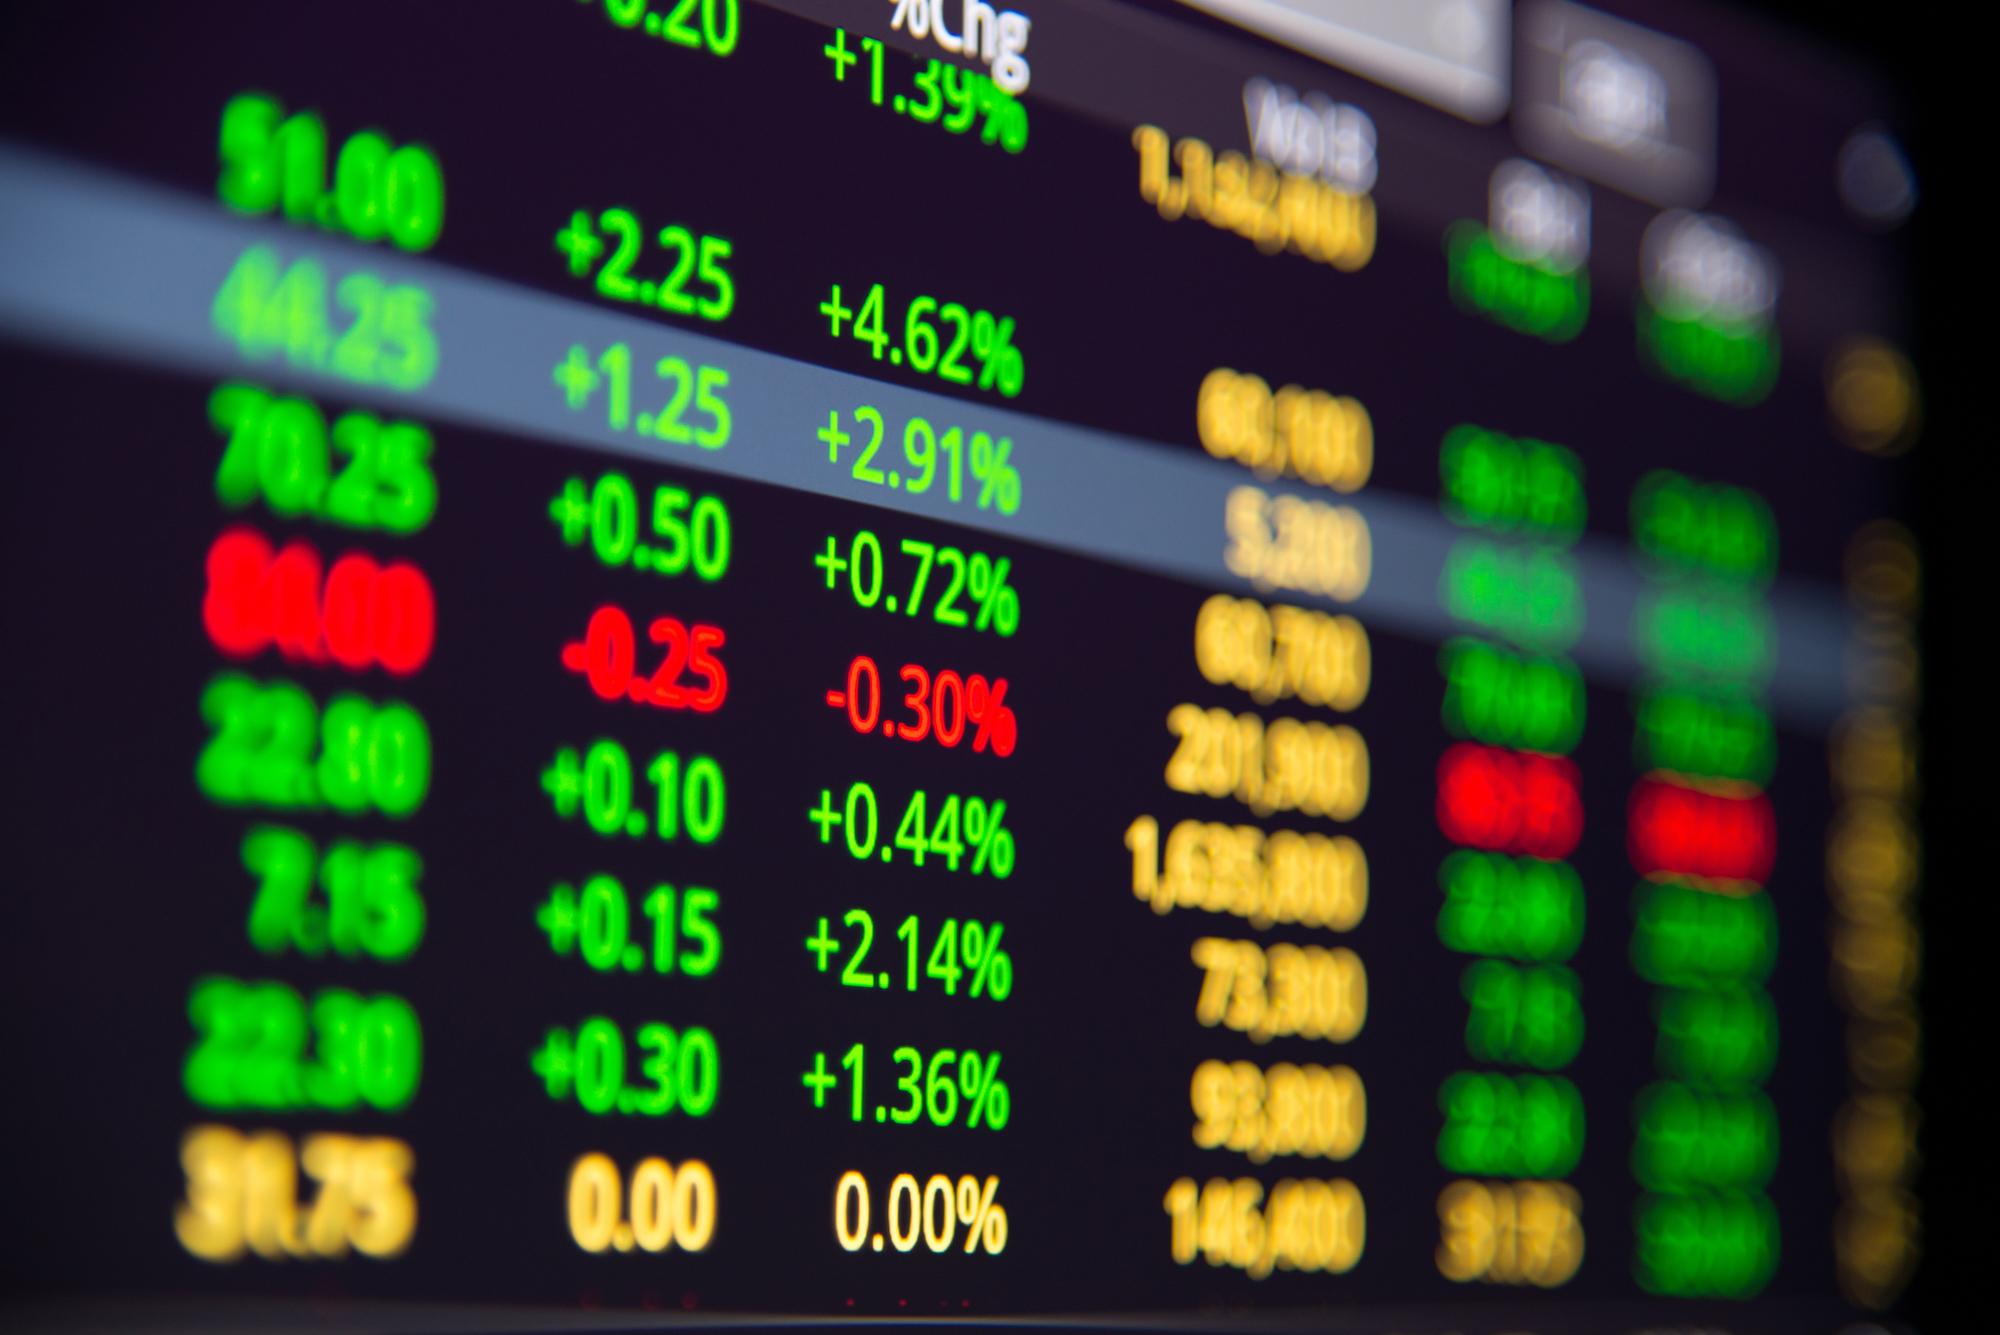 ASX share price rising